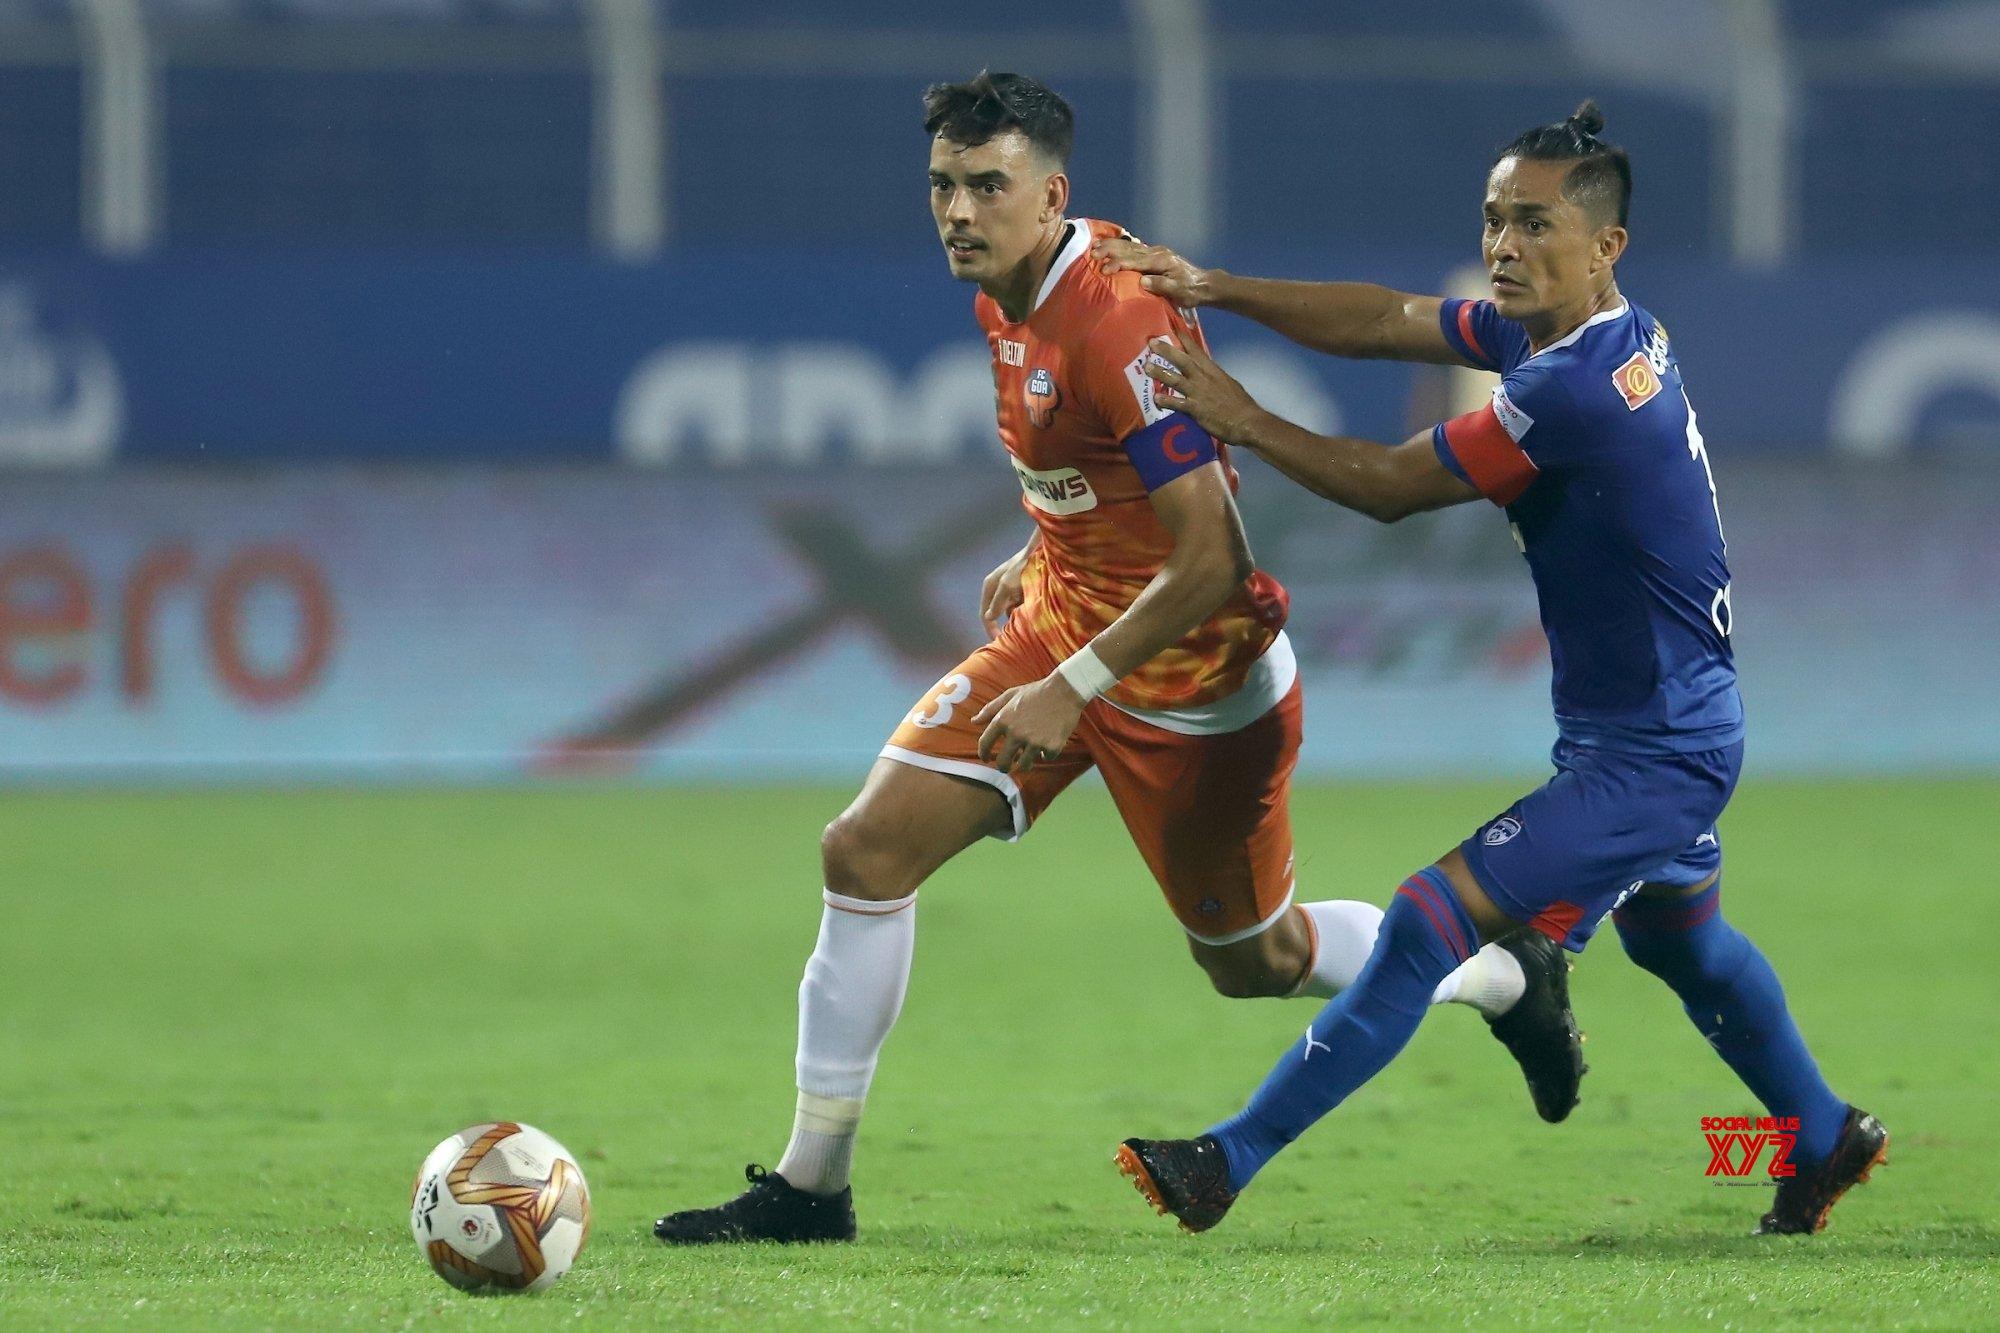 Angulo's brace helps FC Goa to 2-2 draw against Bengaluru FC